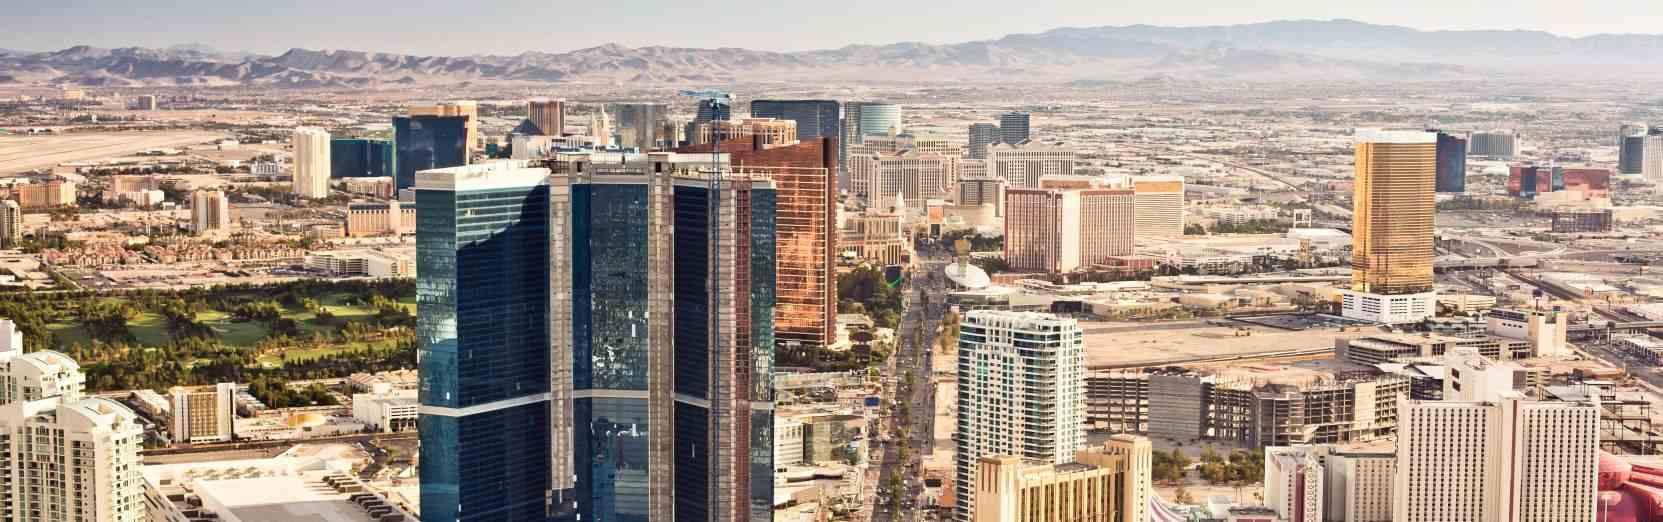 Reise Nach Las Vegas